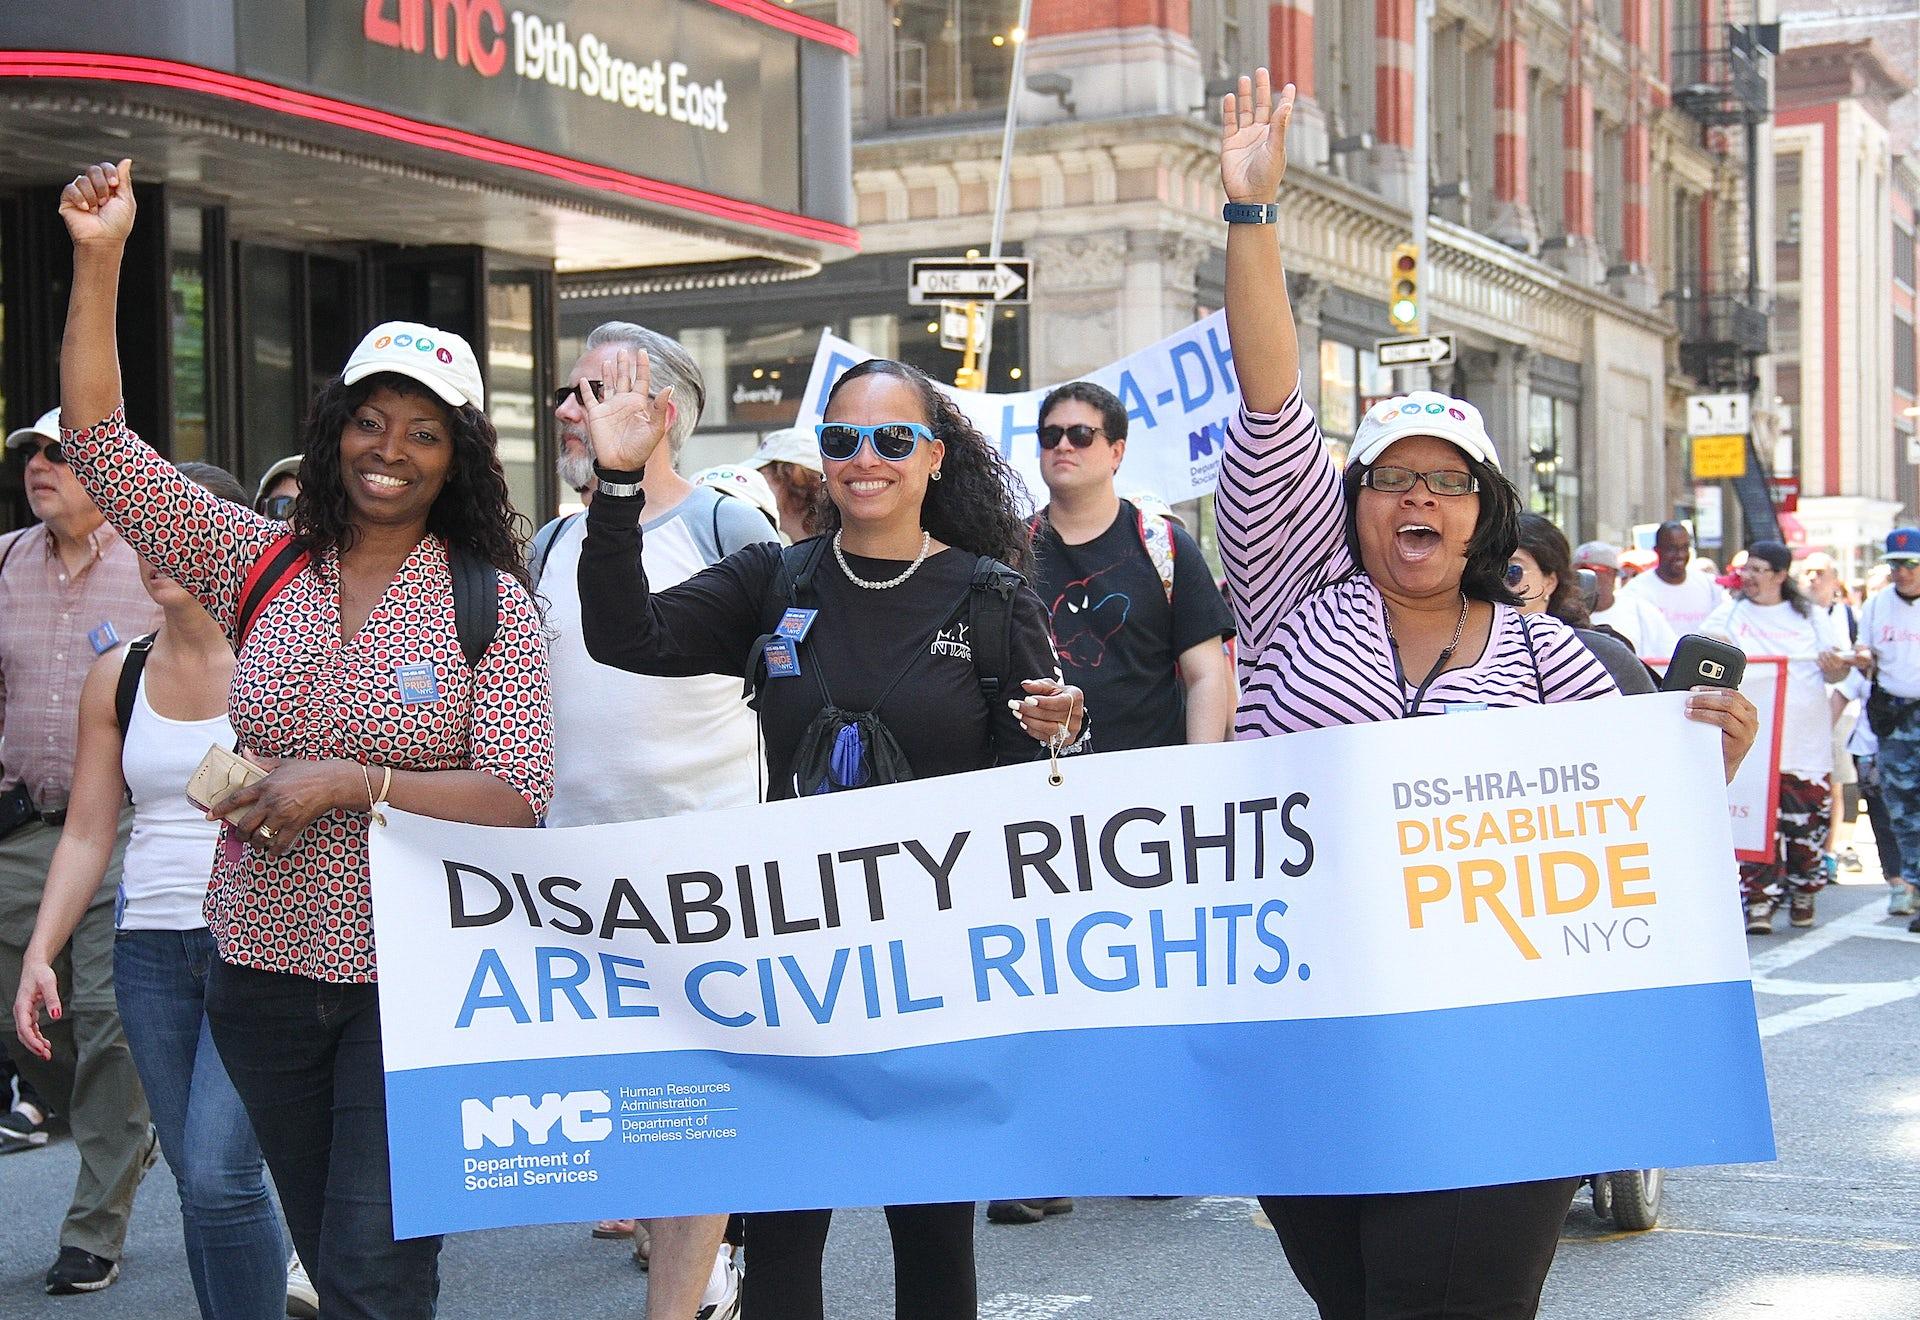 Disability activists